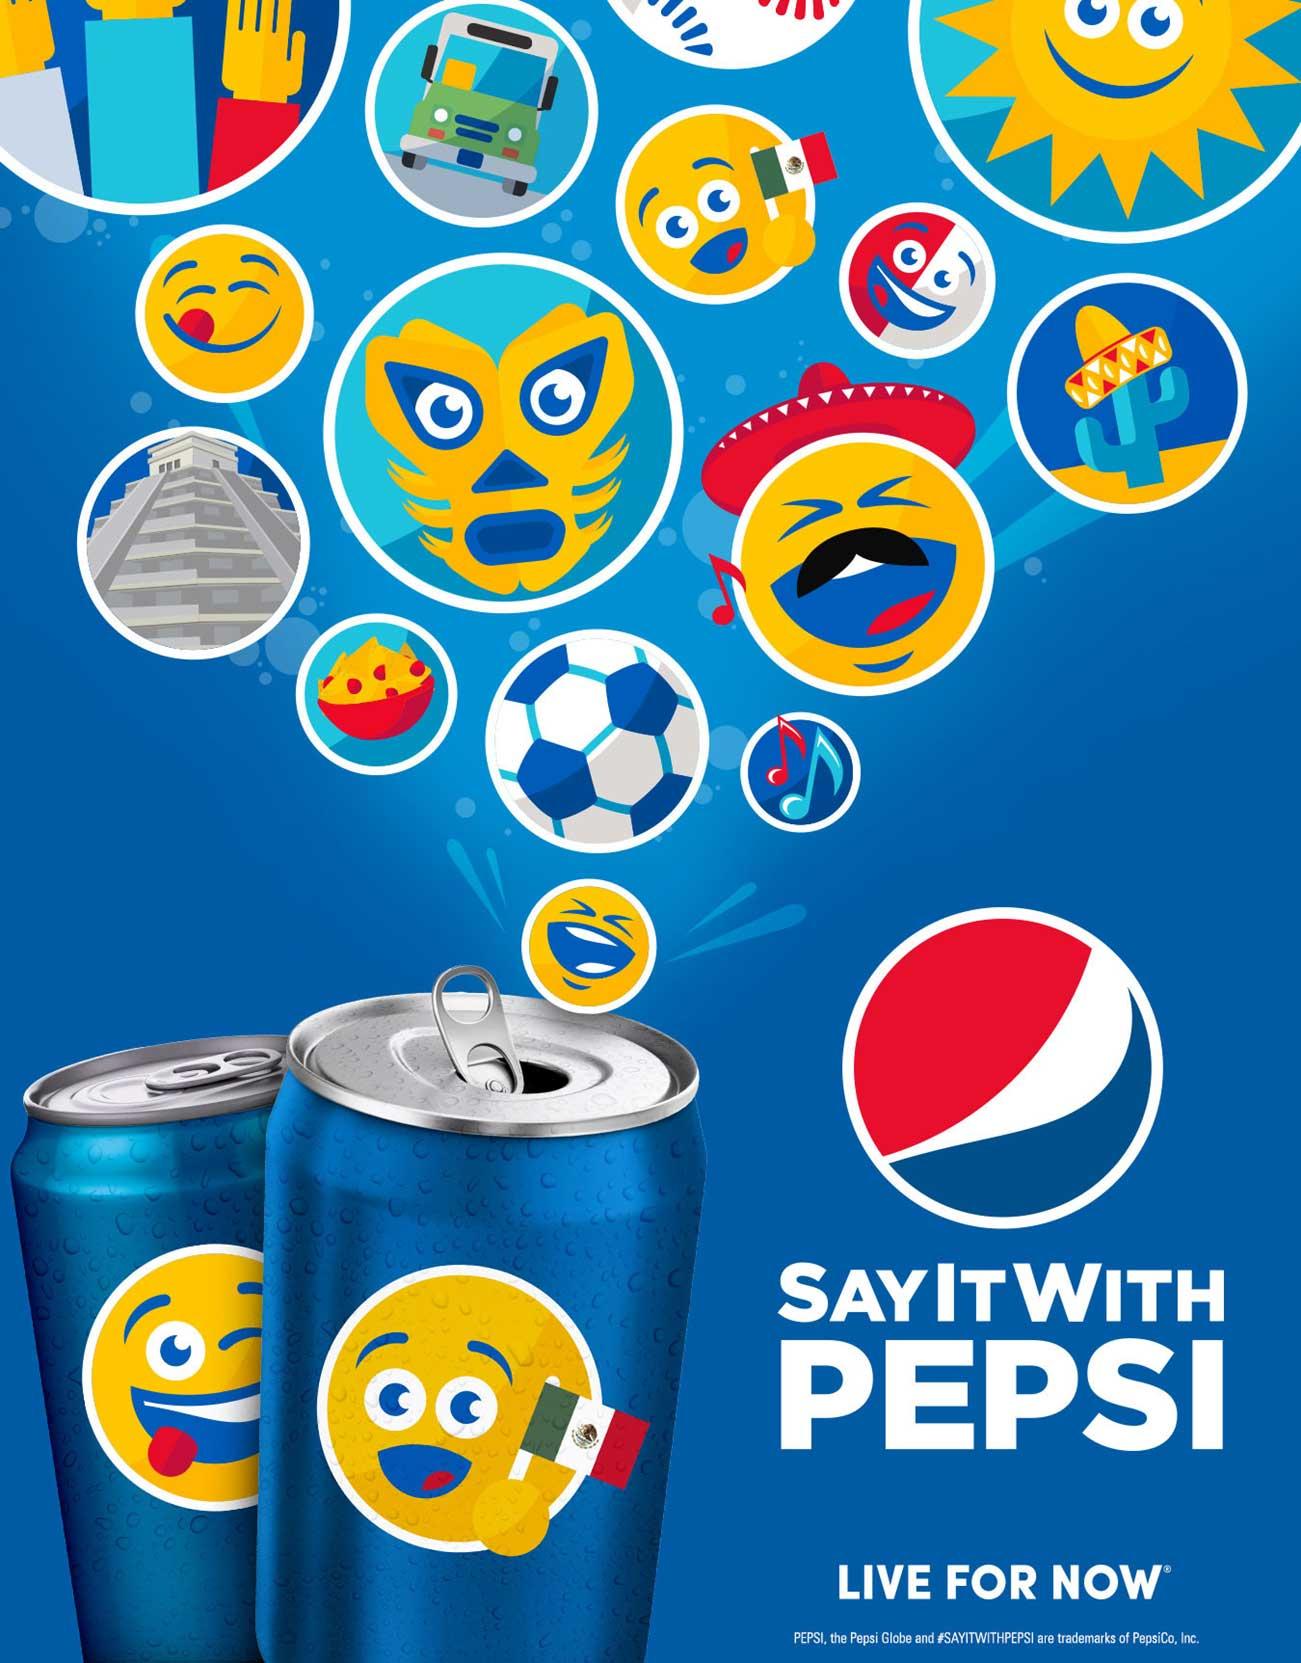 DigaIssoComPepsi. Coleção Capsule Pepsi x Jeremy Scott 76ccfb07ee